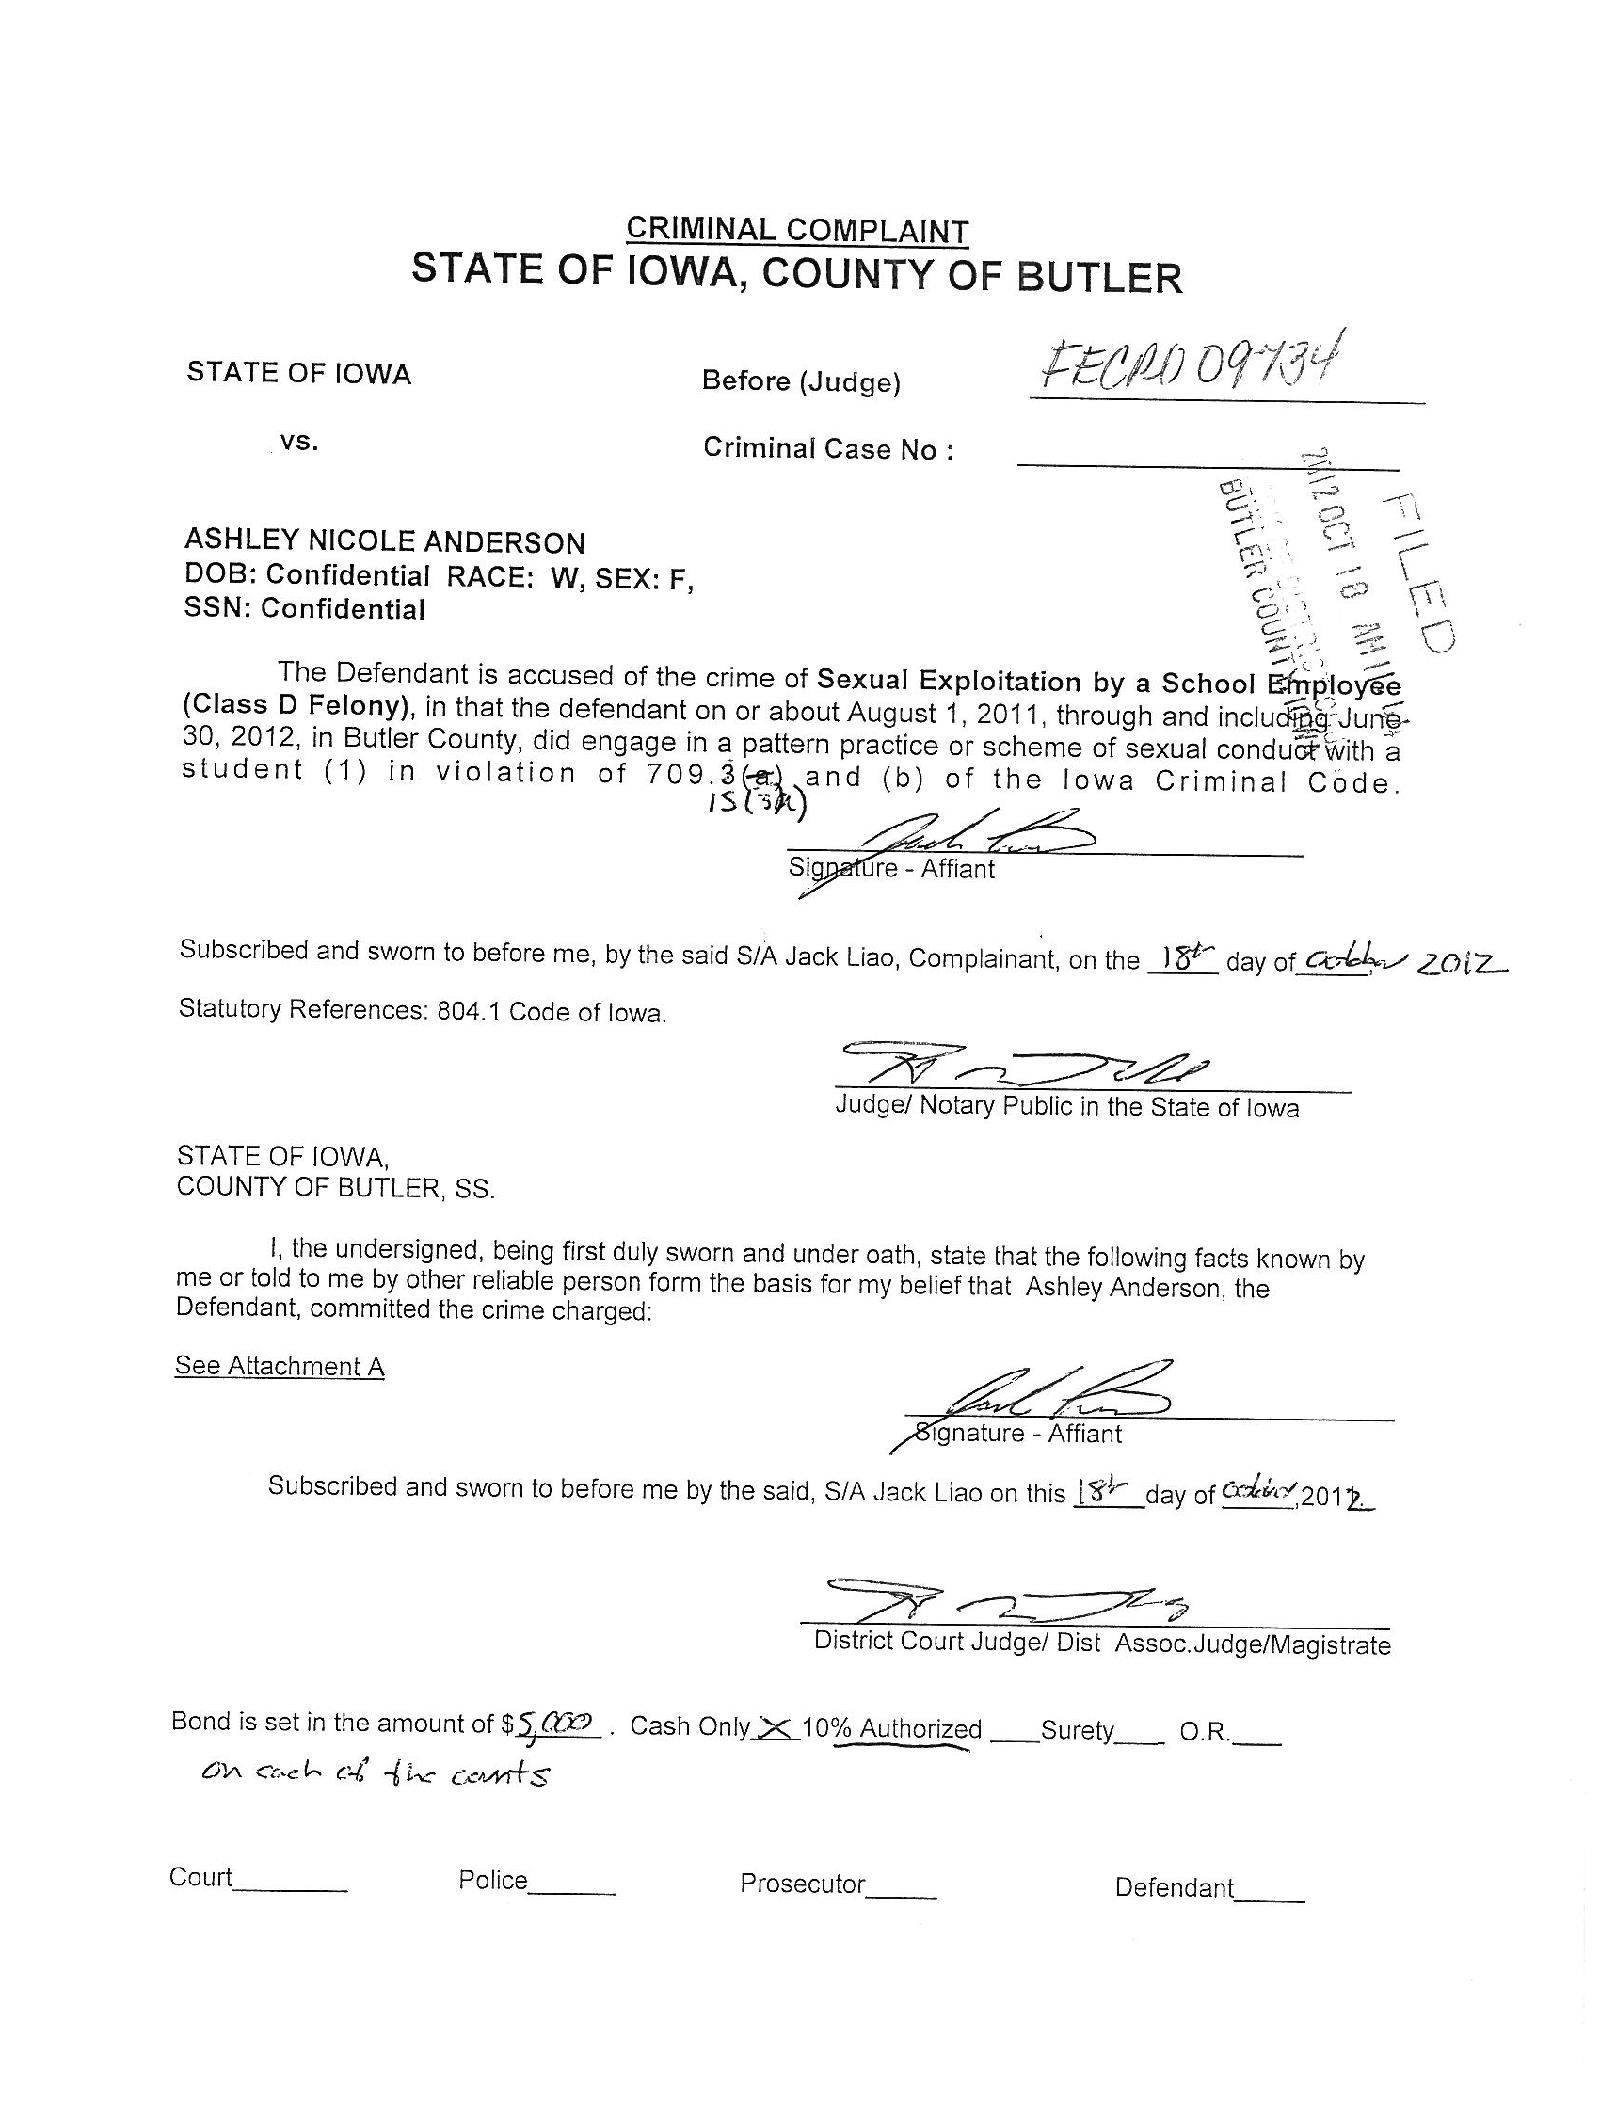 Copy of anderson ashley warrants2.png